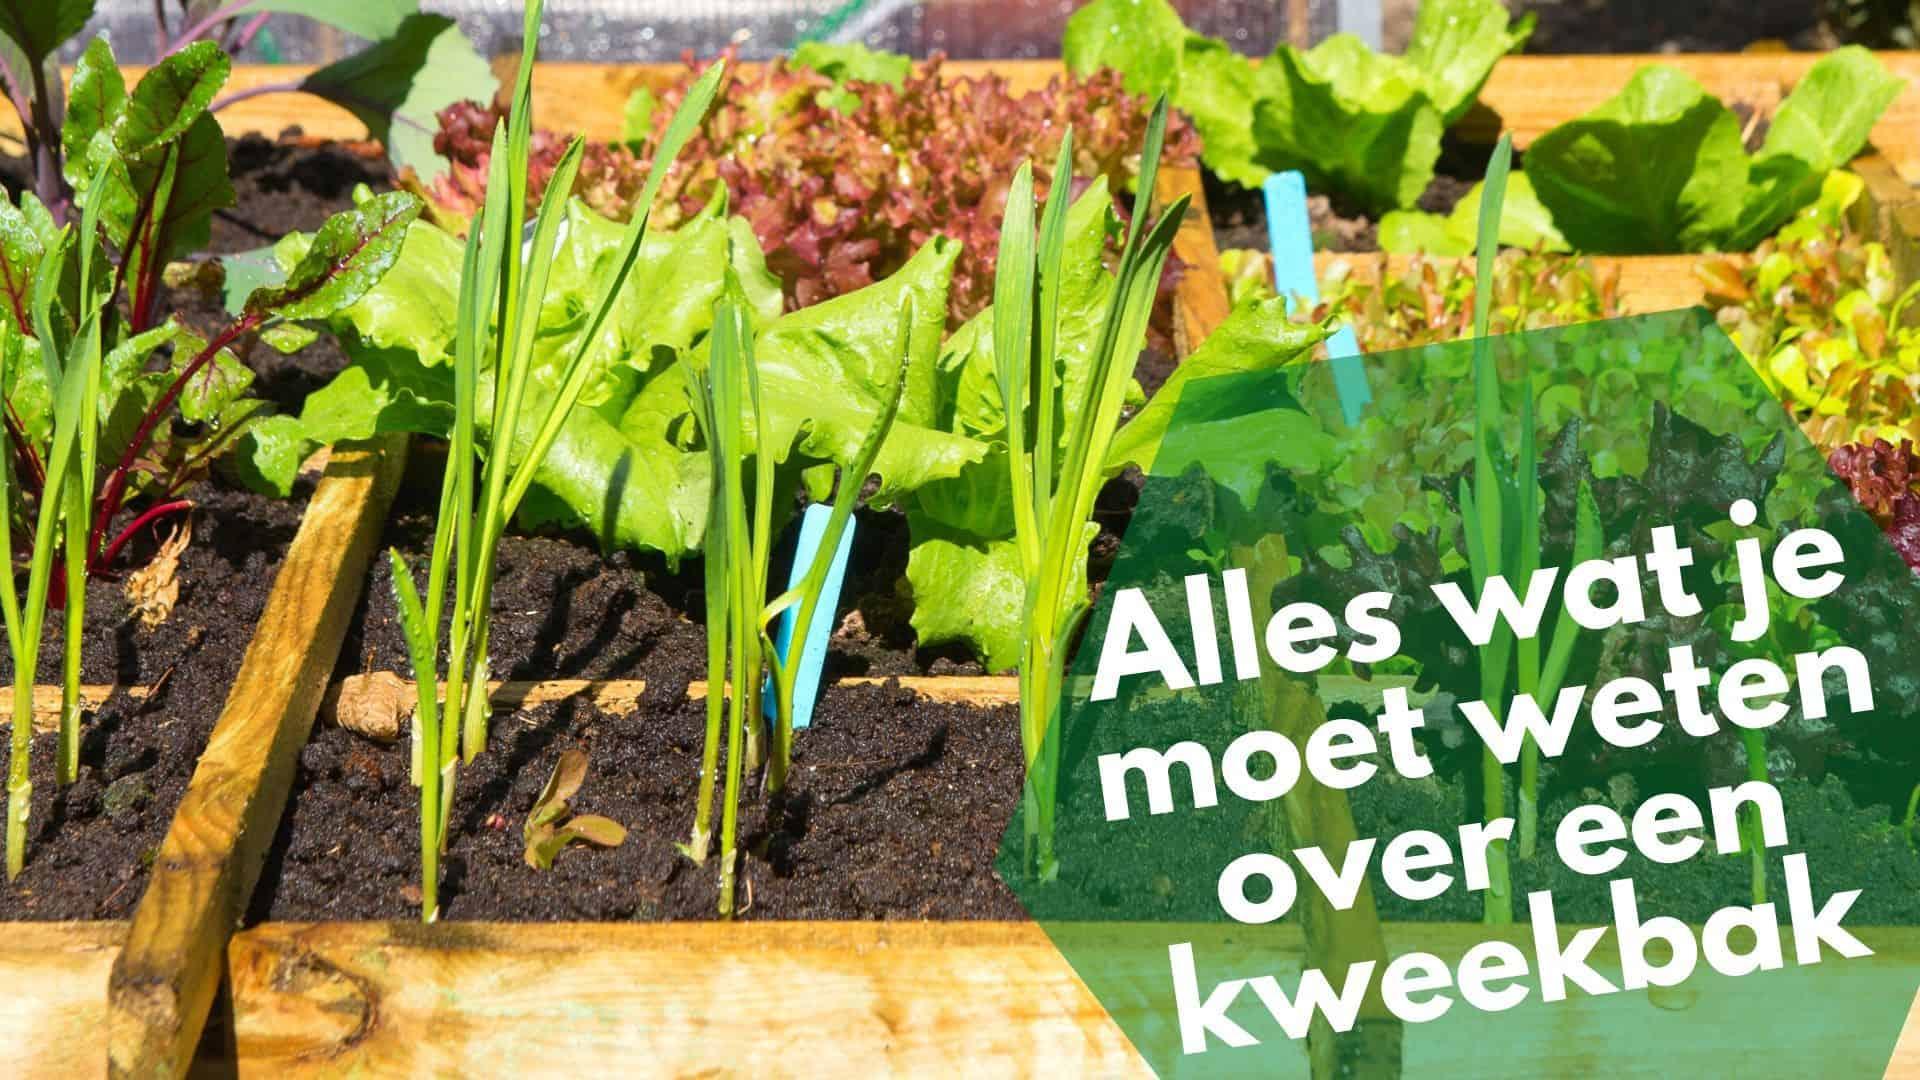 Beste kweekbakken beoordeeld & kweektips: wat ga jij kweken?